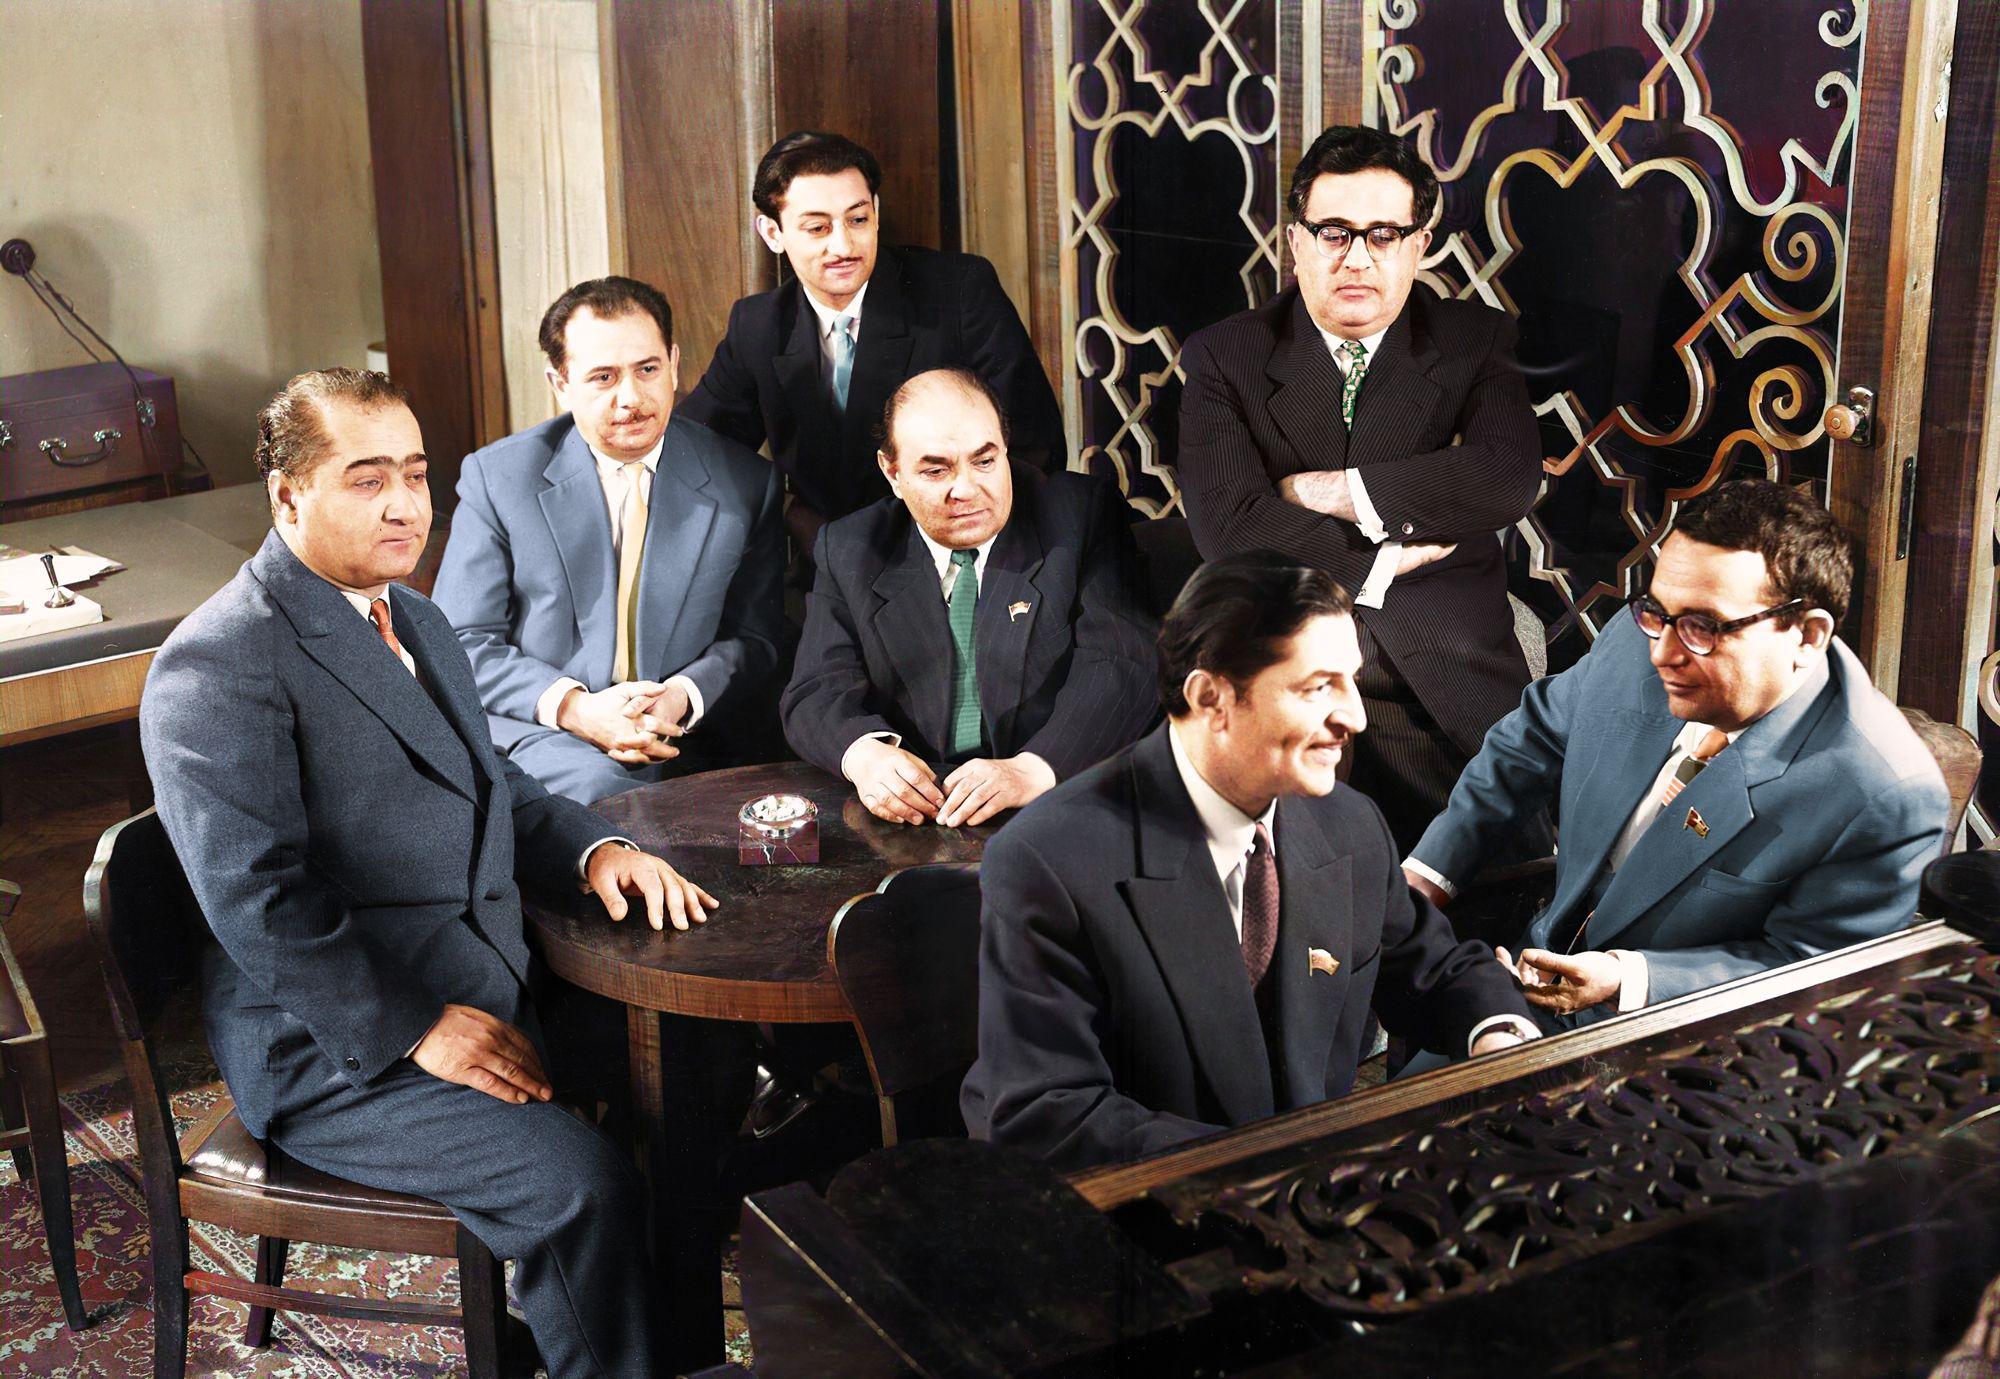 Azerbaijani Composers 1960s Colorized Photos Photography Photo